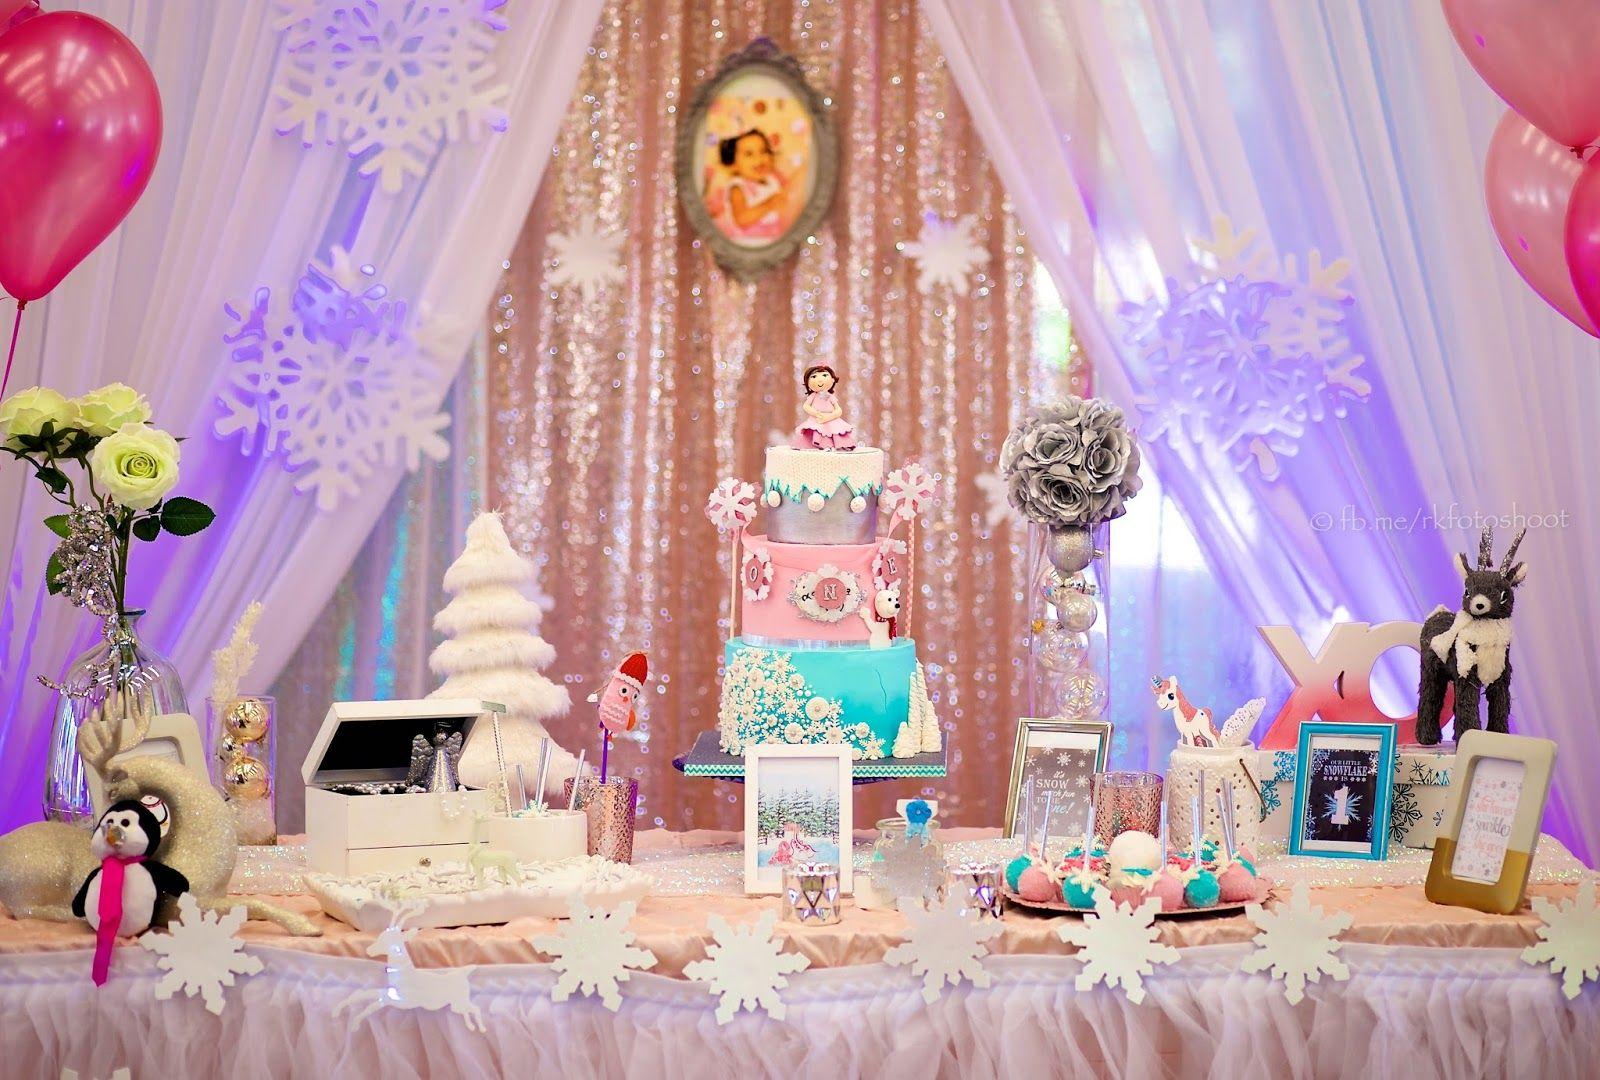 Wedding stage decor ideas  eningzevent   awhimsicalwinteronderlandbirthday